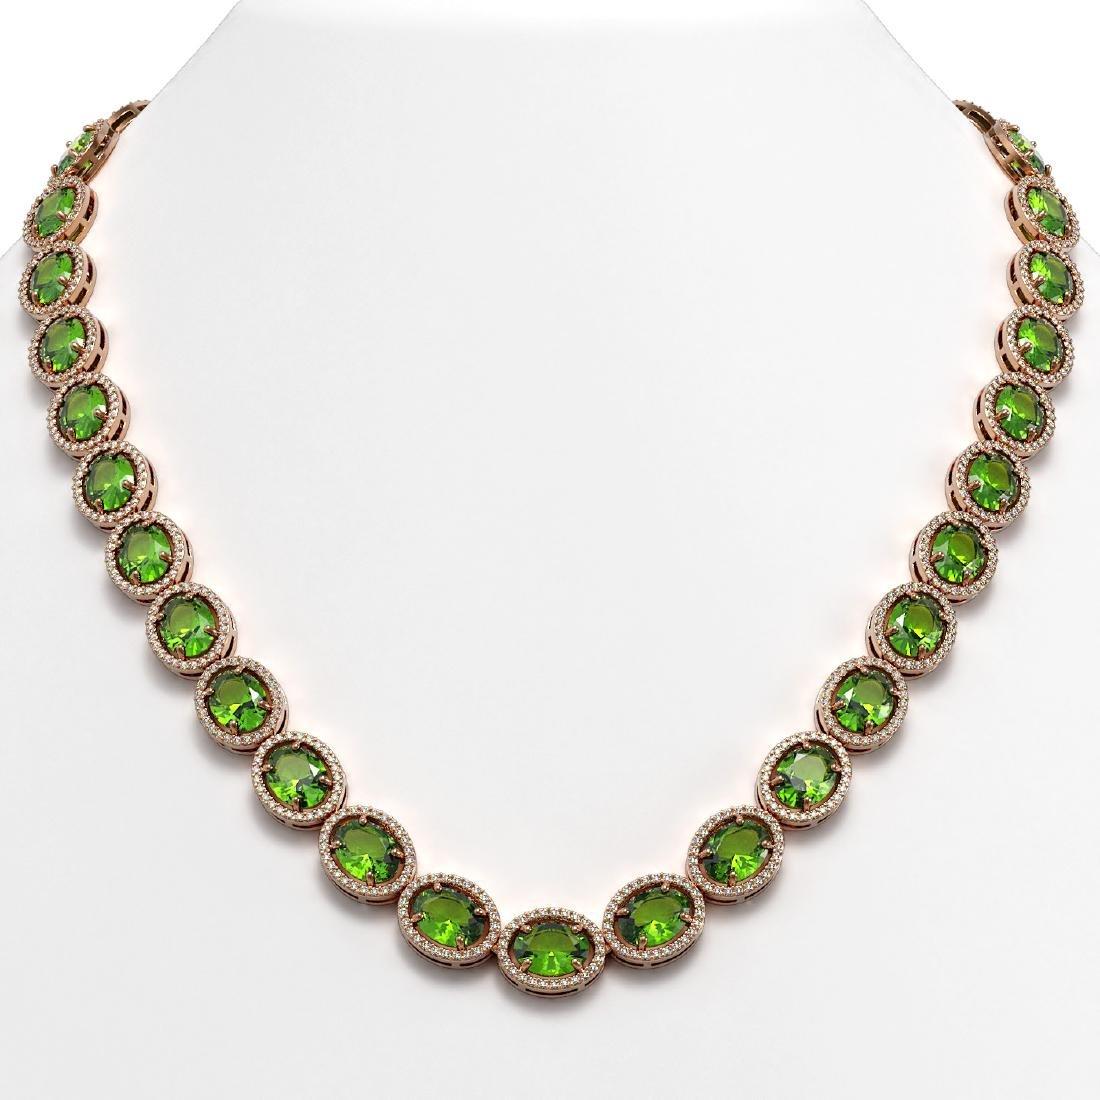 64.84 CTW Peridot & Diamond Halo Necklace 10K Rose Gold